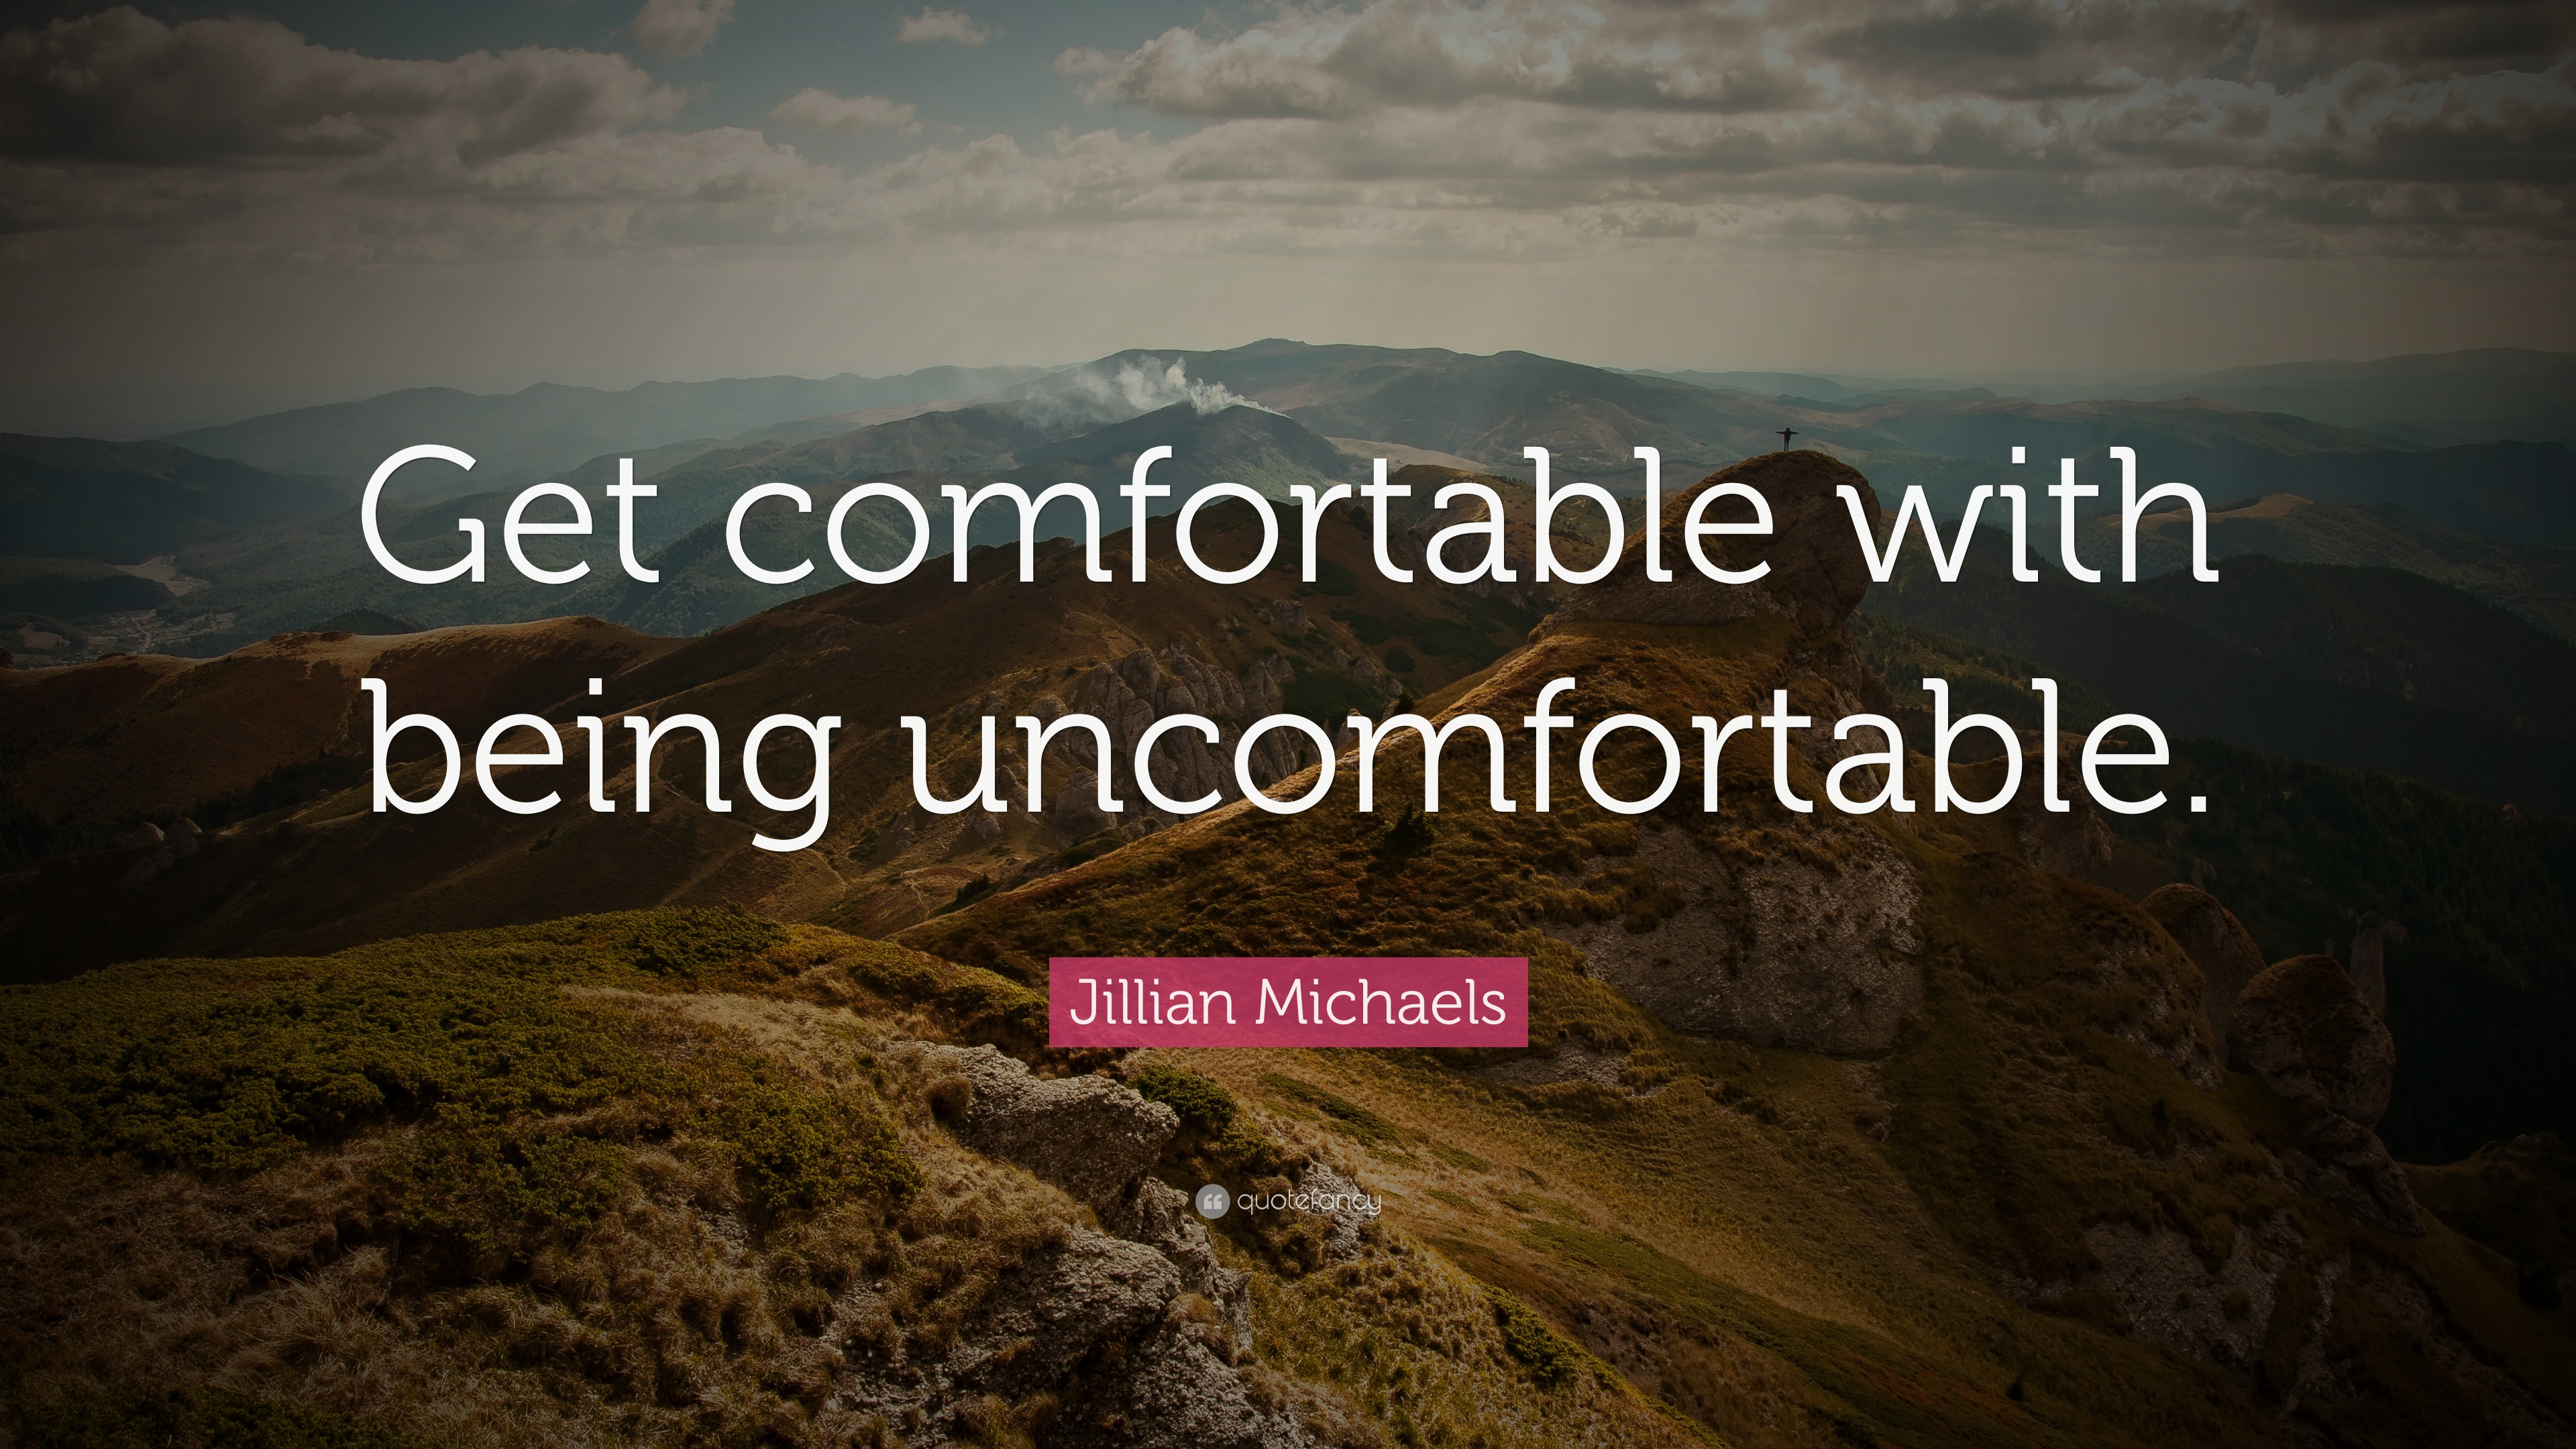 Conor Mcgregor Quote Wallpaper Jillian Michaels Quote Get Comfortable With Being